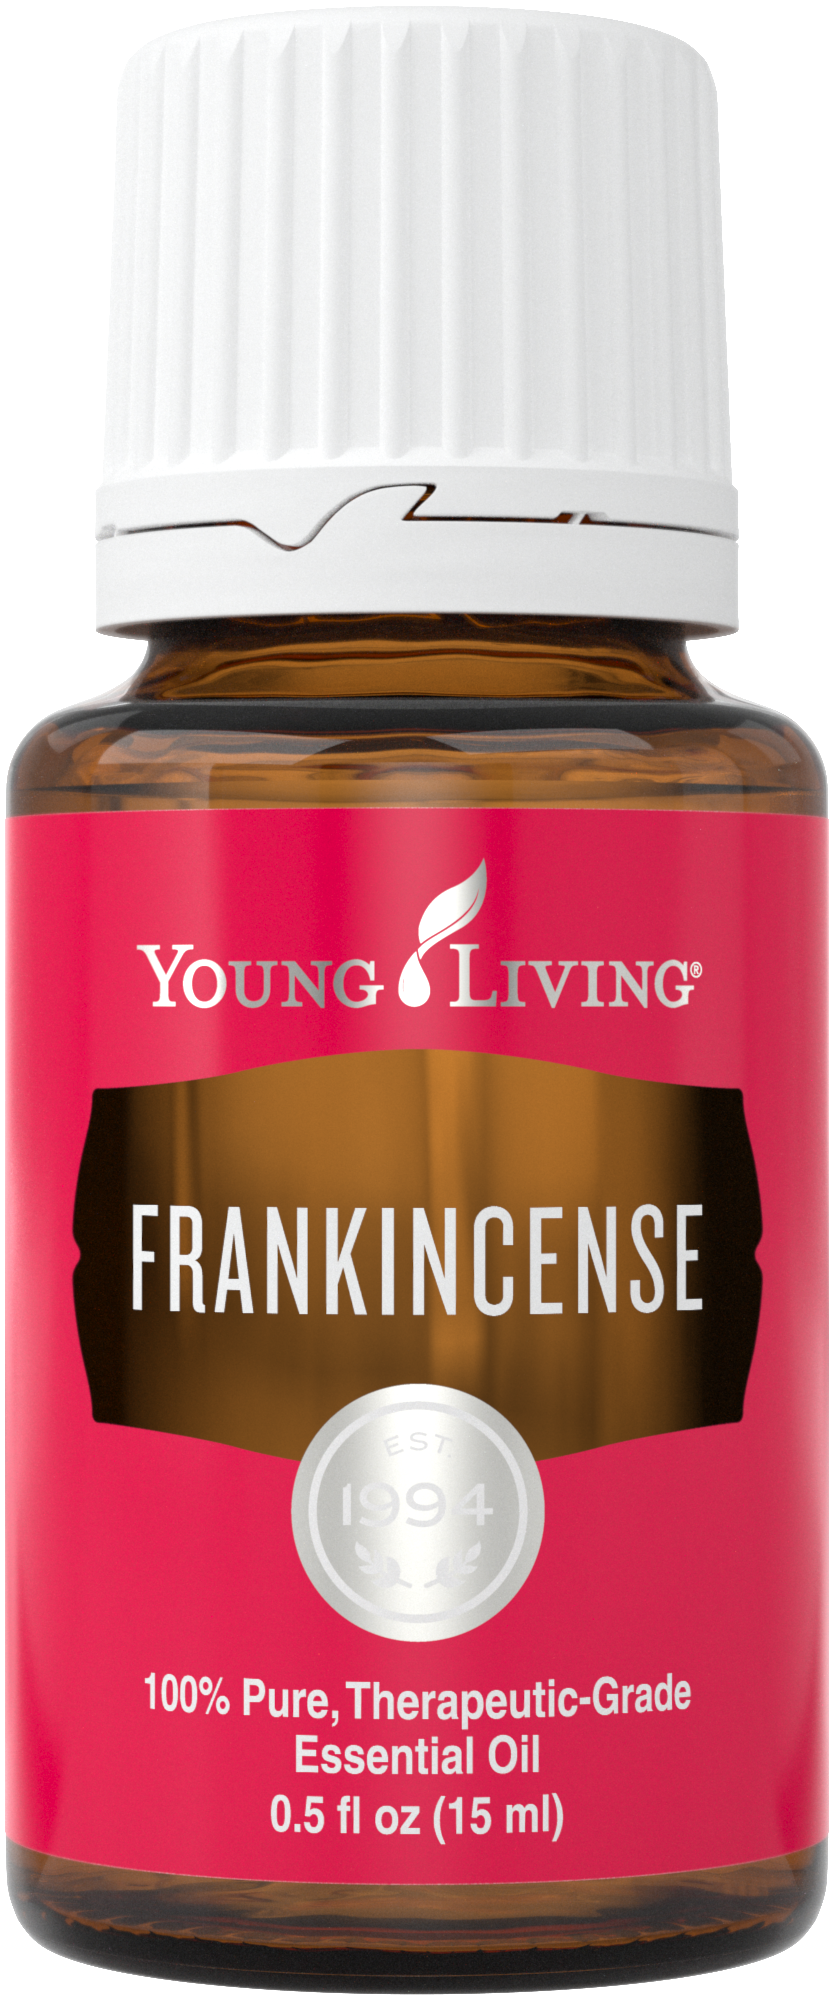 Frankincense.png